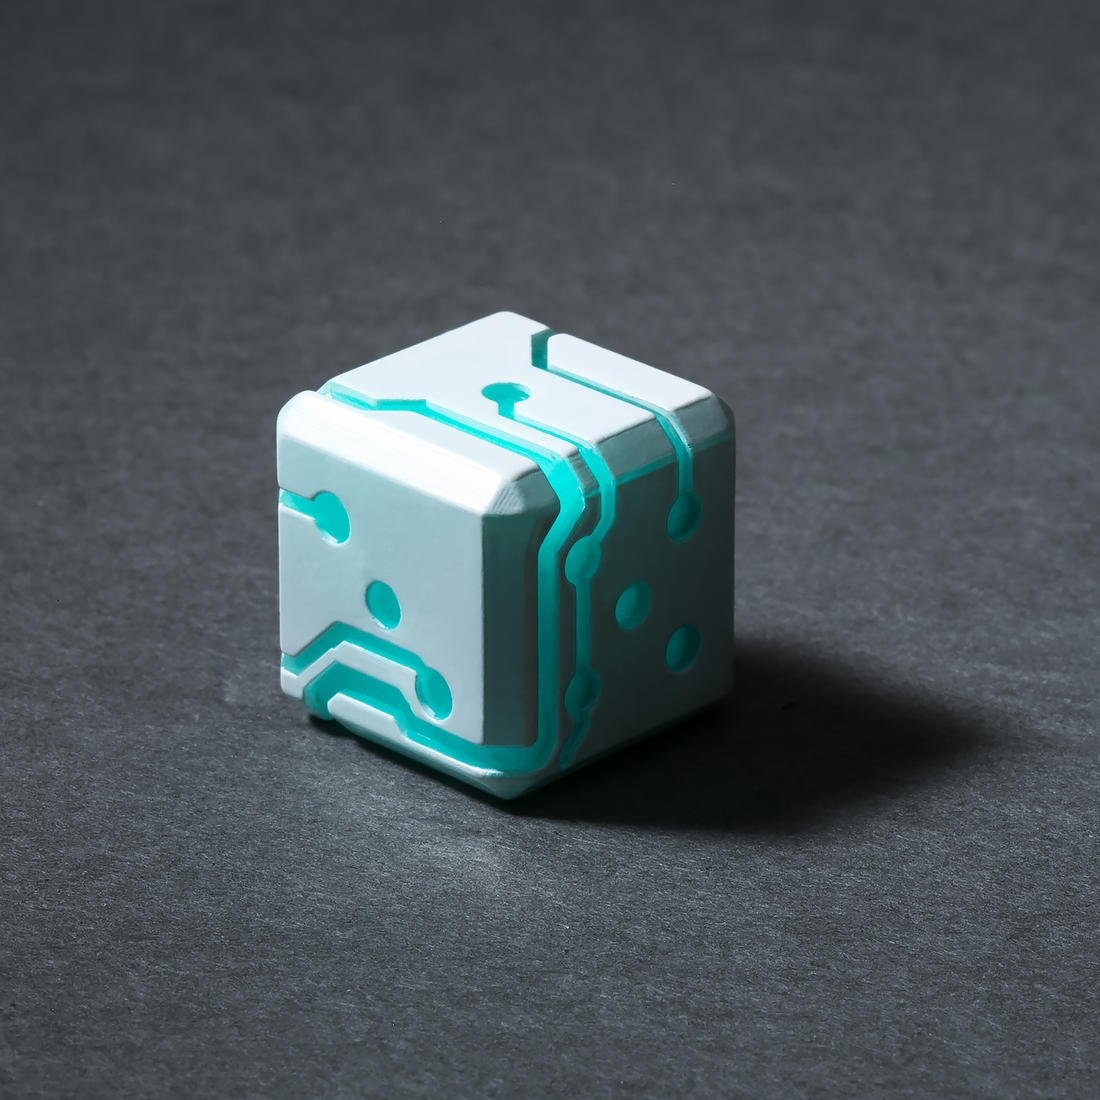 Space Roller Science Fiction Würfel : Blau auf Weiss